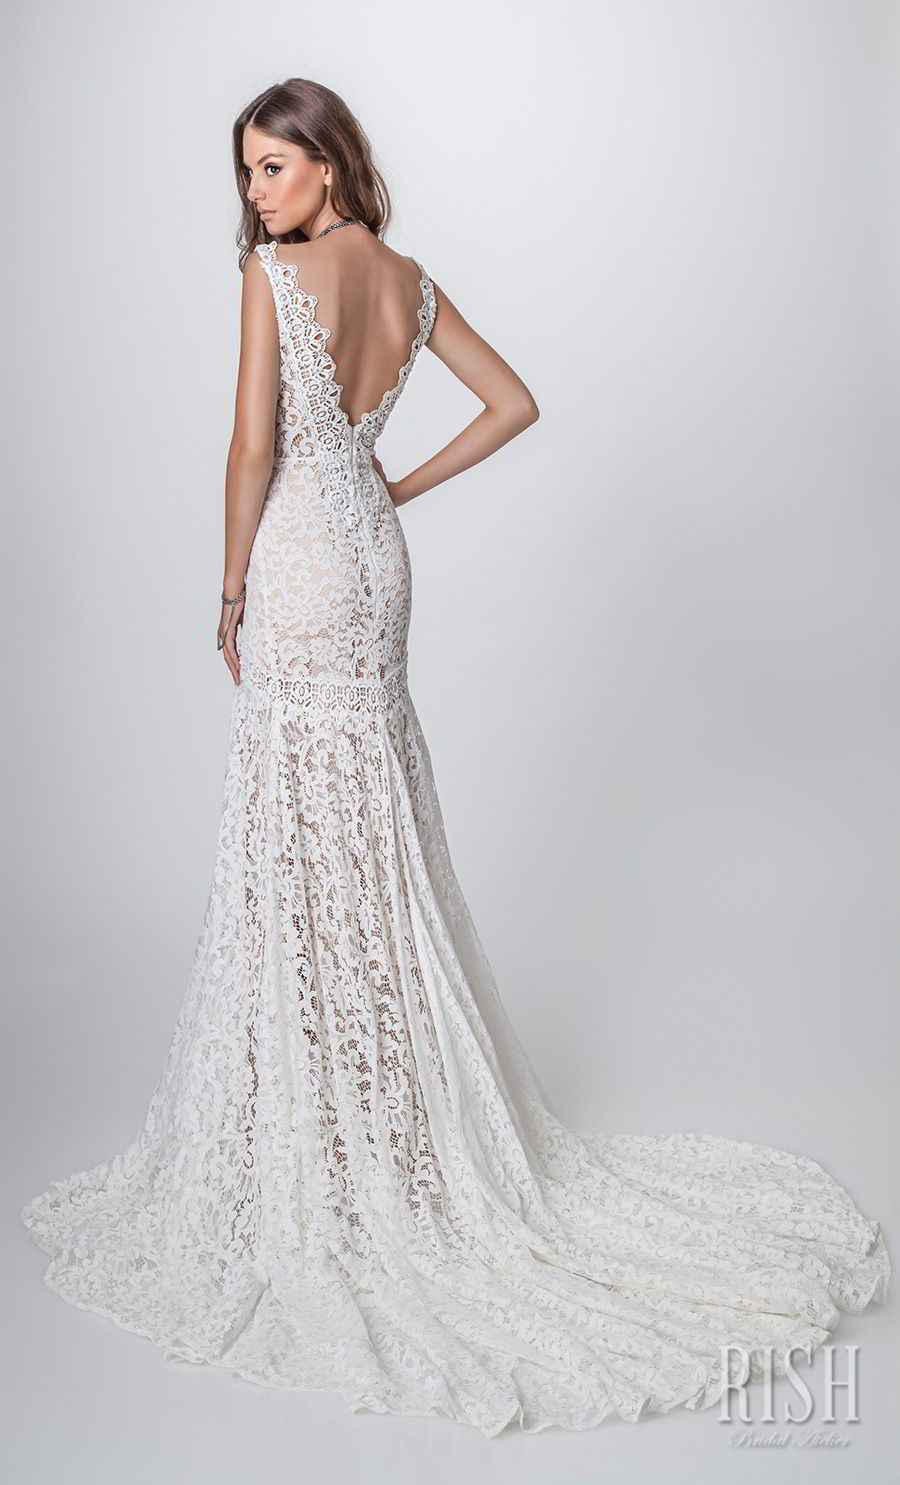 rish bridal sun dance 2018 sleeveless deep v neck full embellishment elegant fit and flare wedding dress open v back chapel train (nina) bv